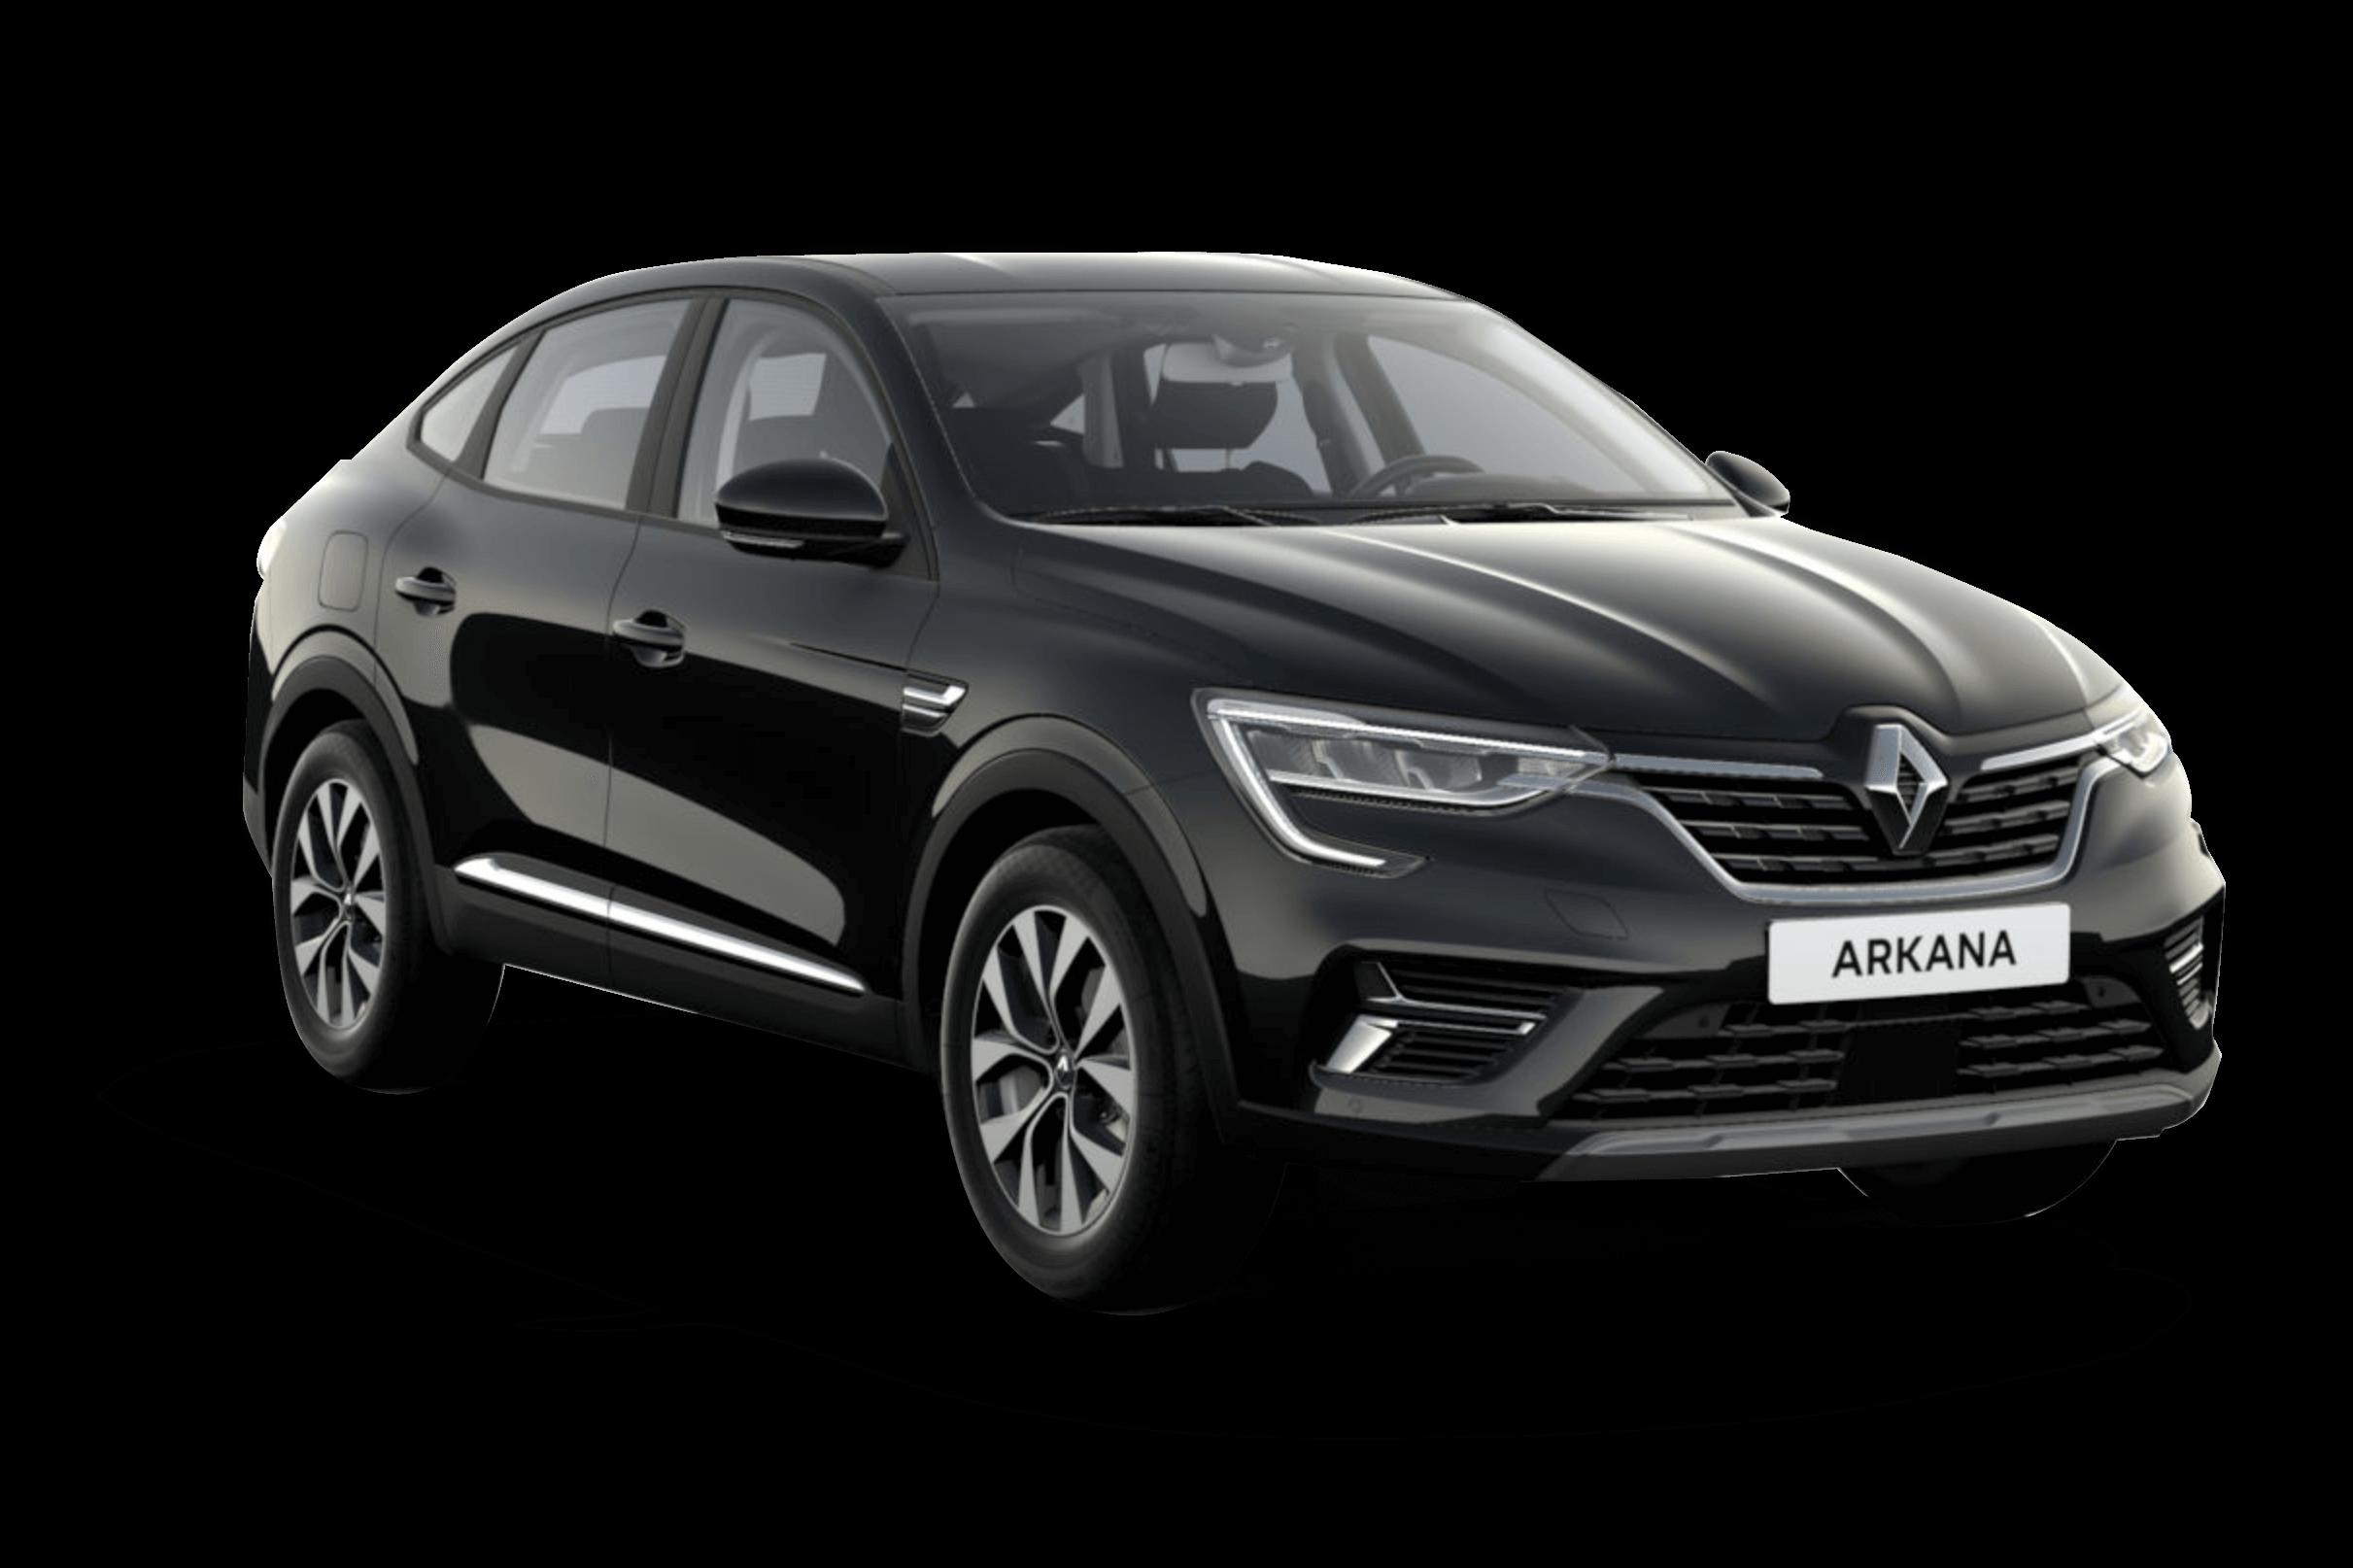 Renault-Arkana-Zen-Svart-Etoile